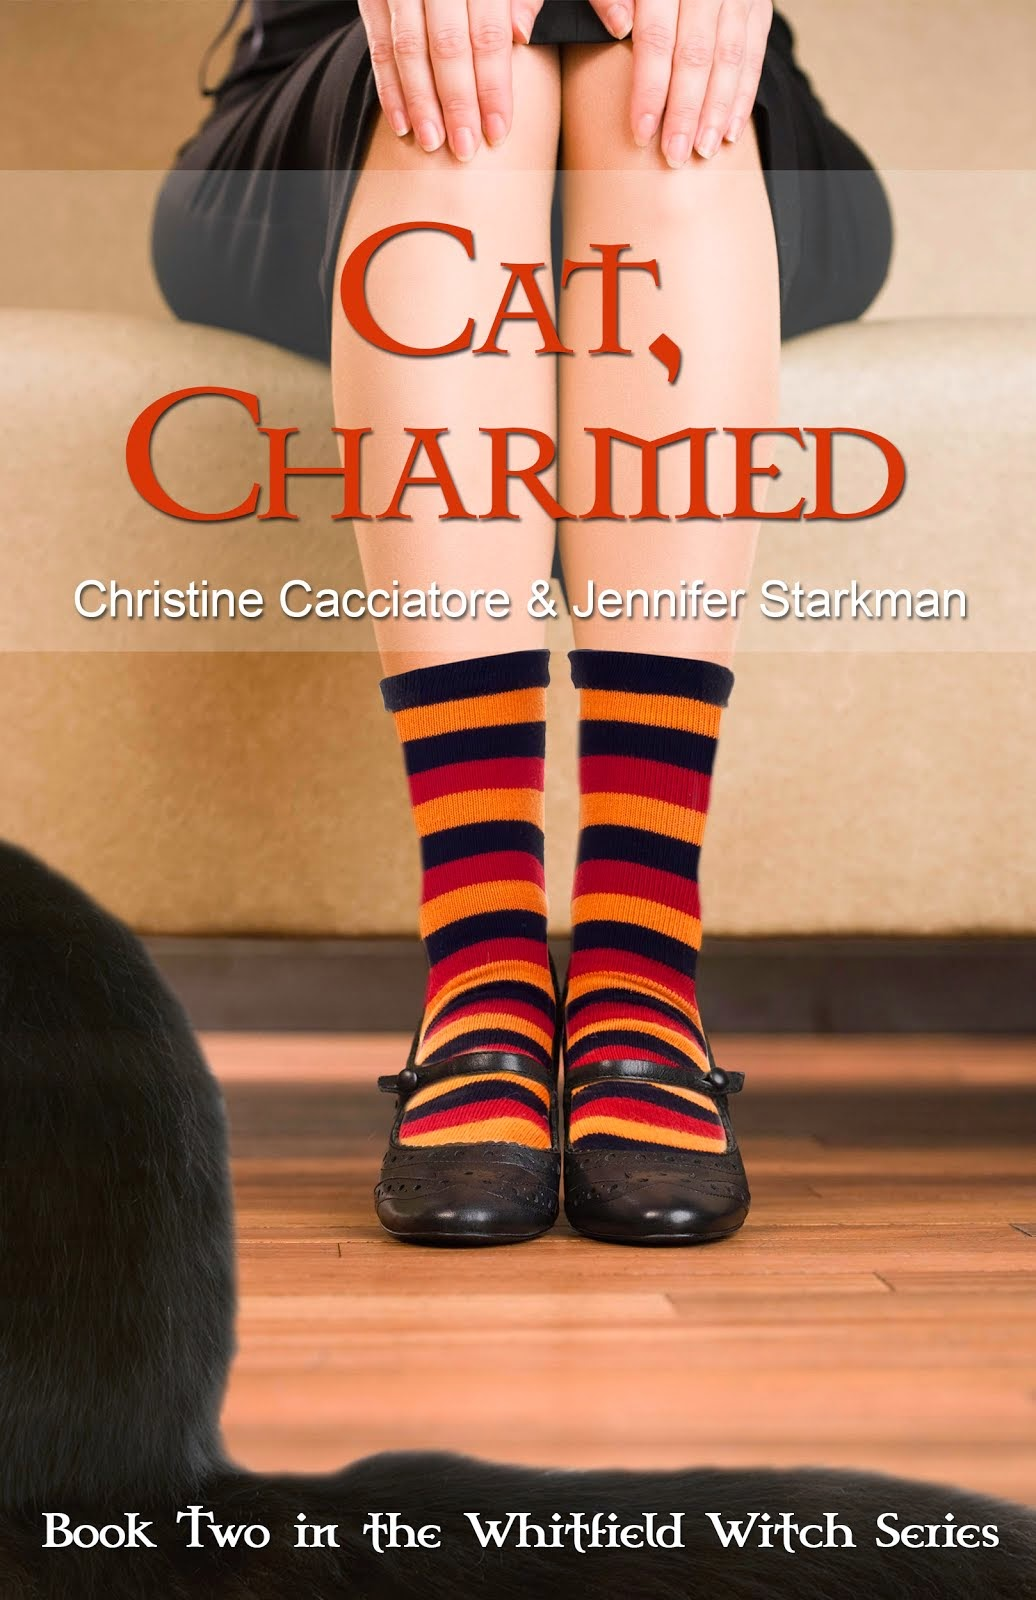 Cat, Charmed